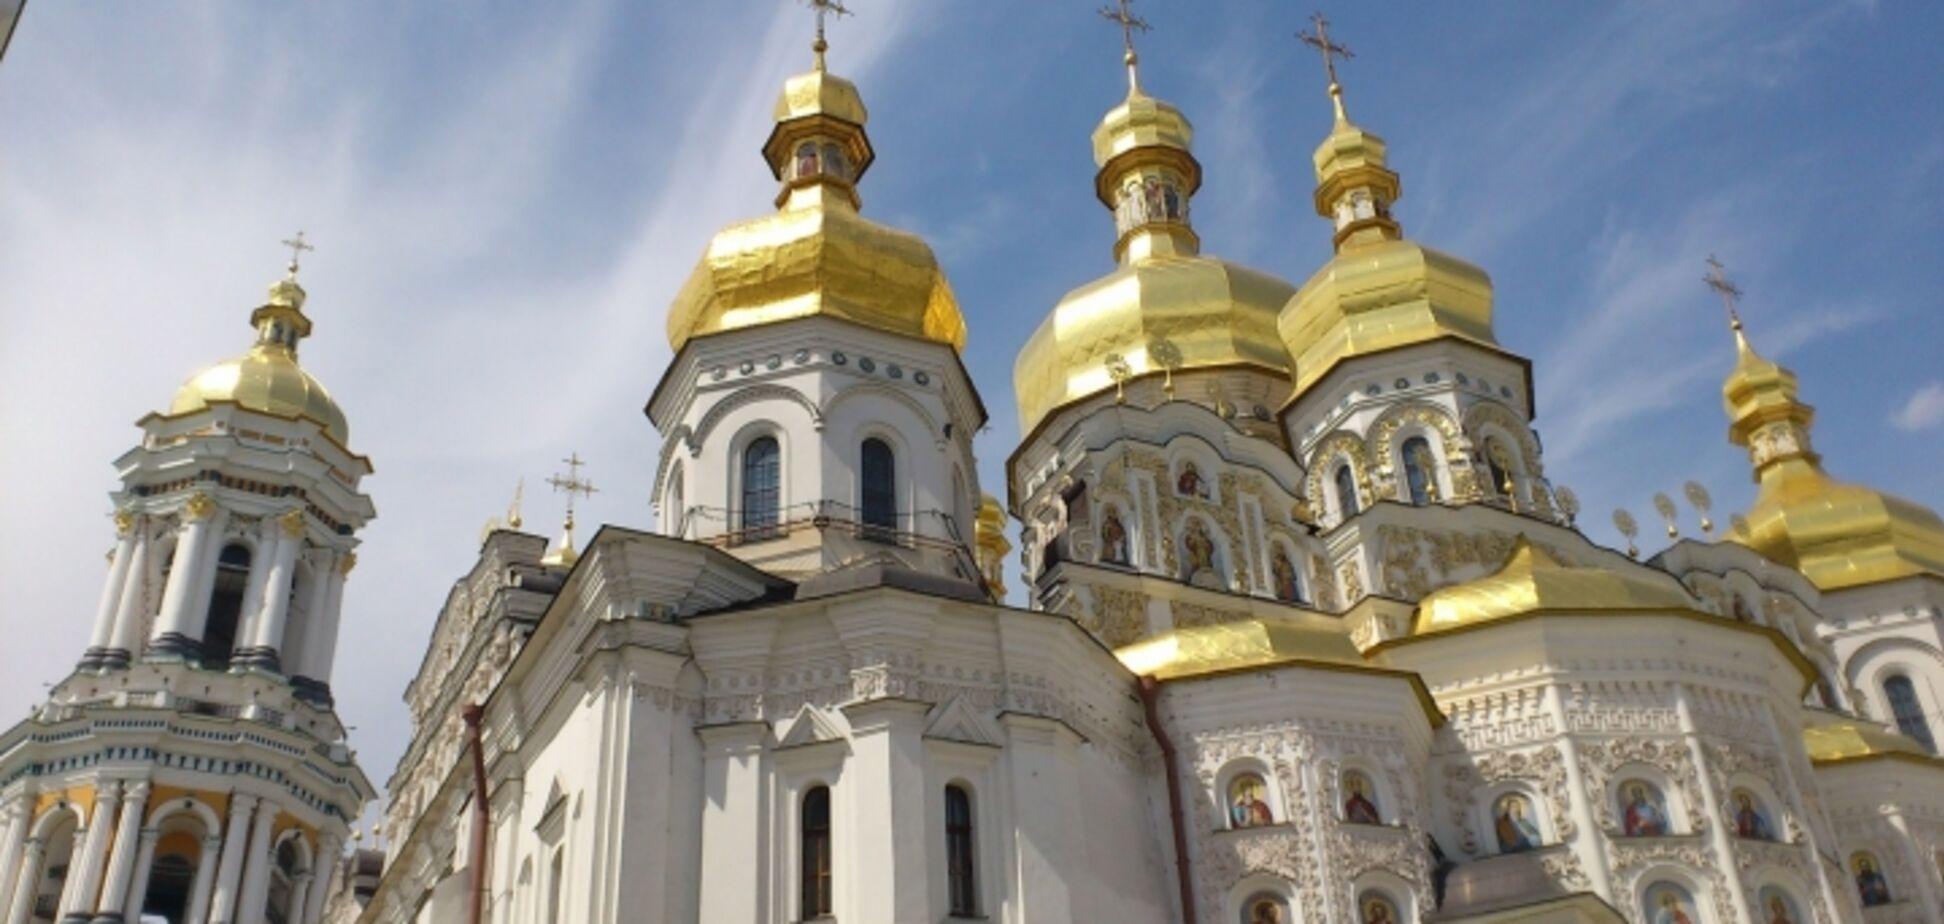 Священника Киево-Печерской Лавры взяли на контрабанде 1,4 млн грн